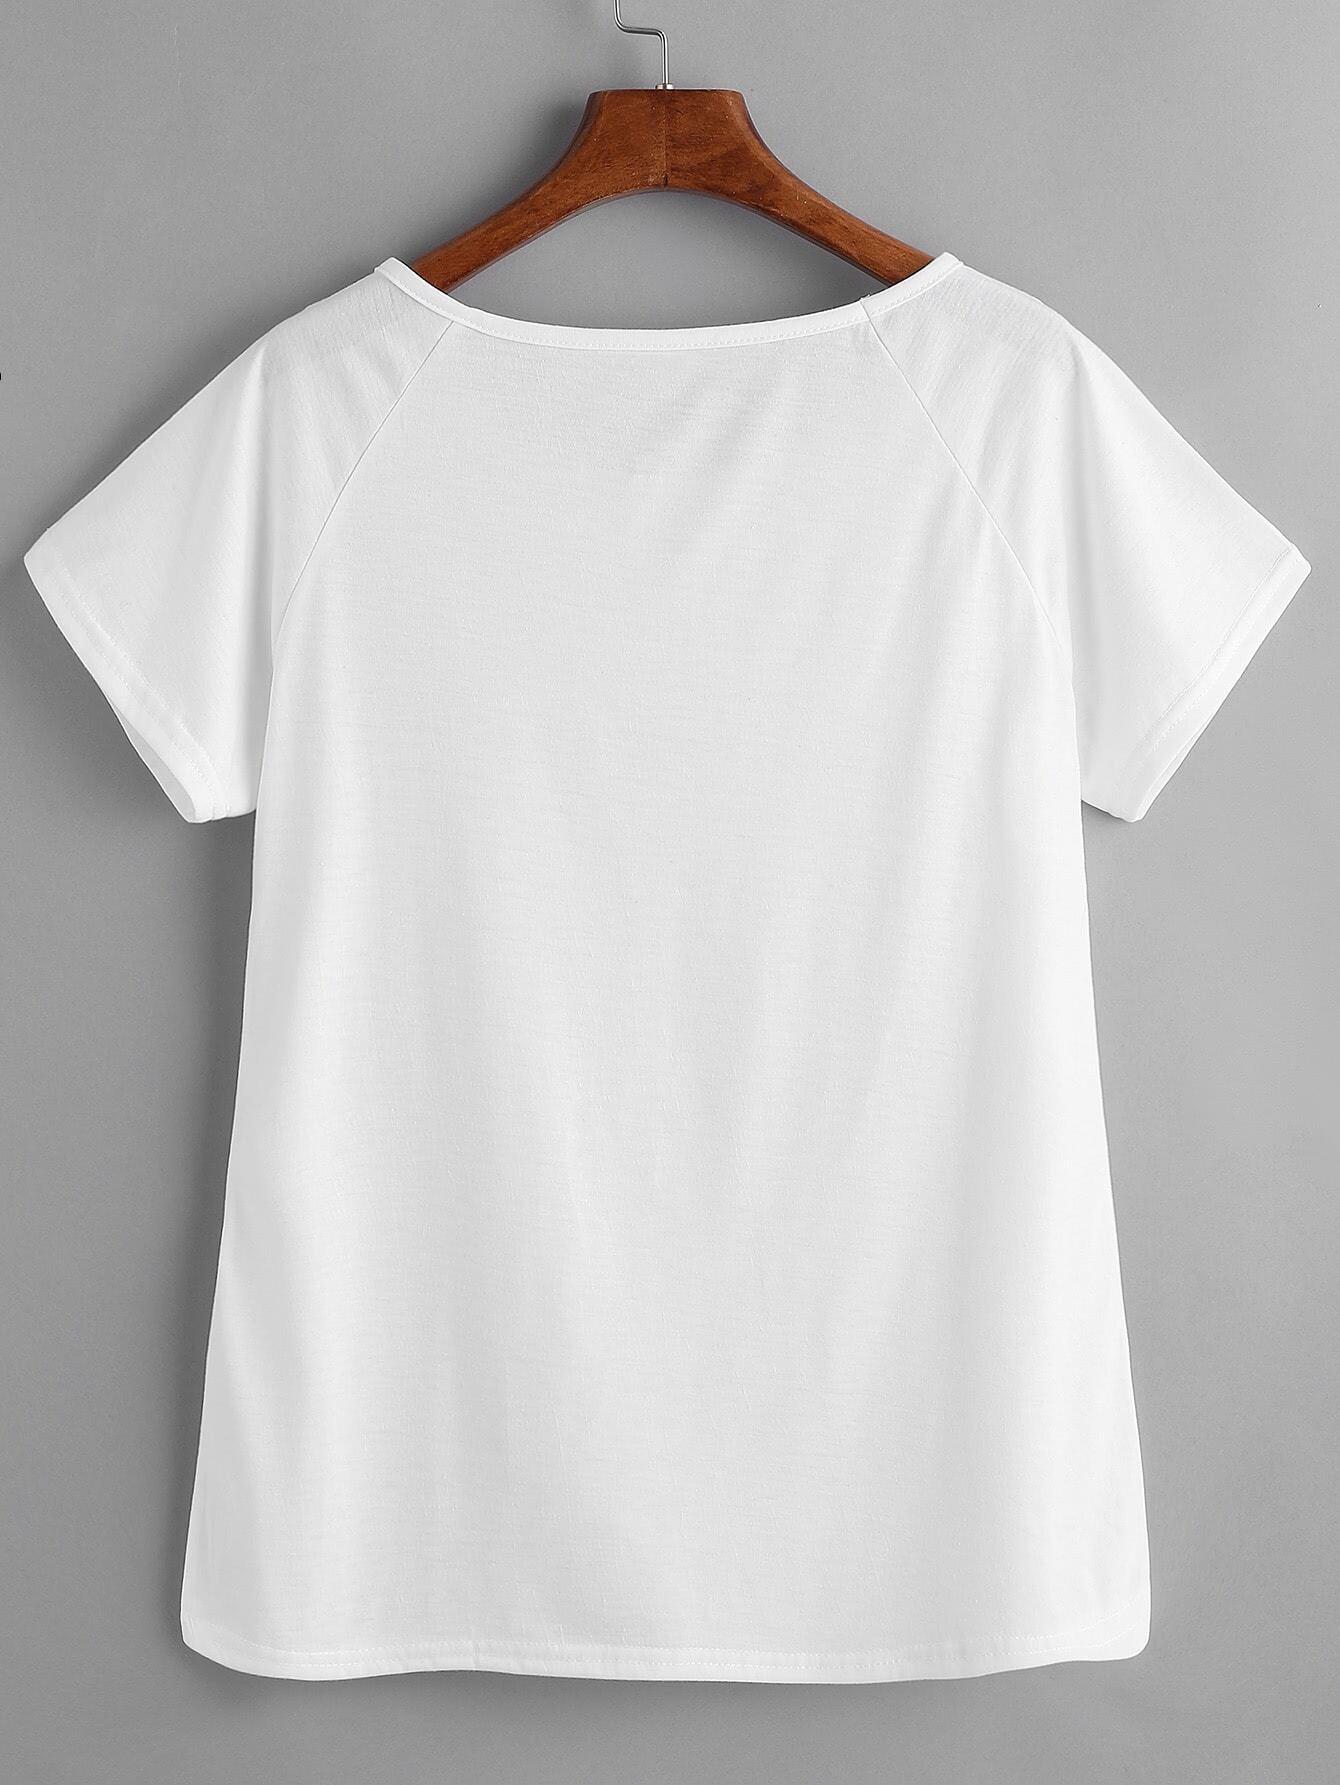 Модная вышивка на футболку